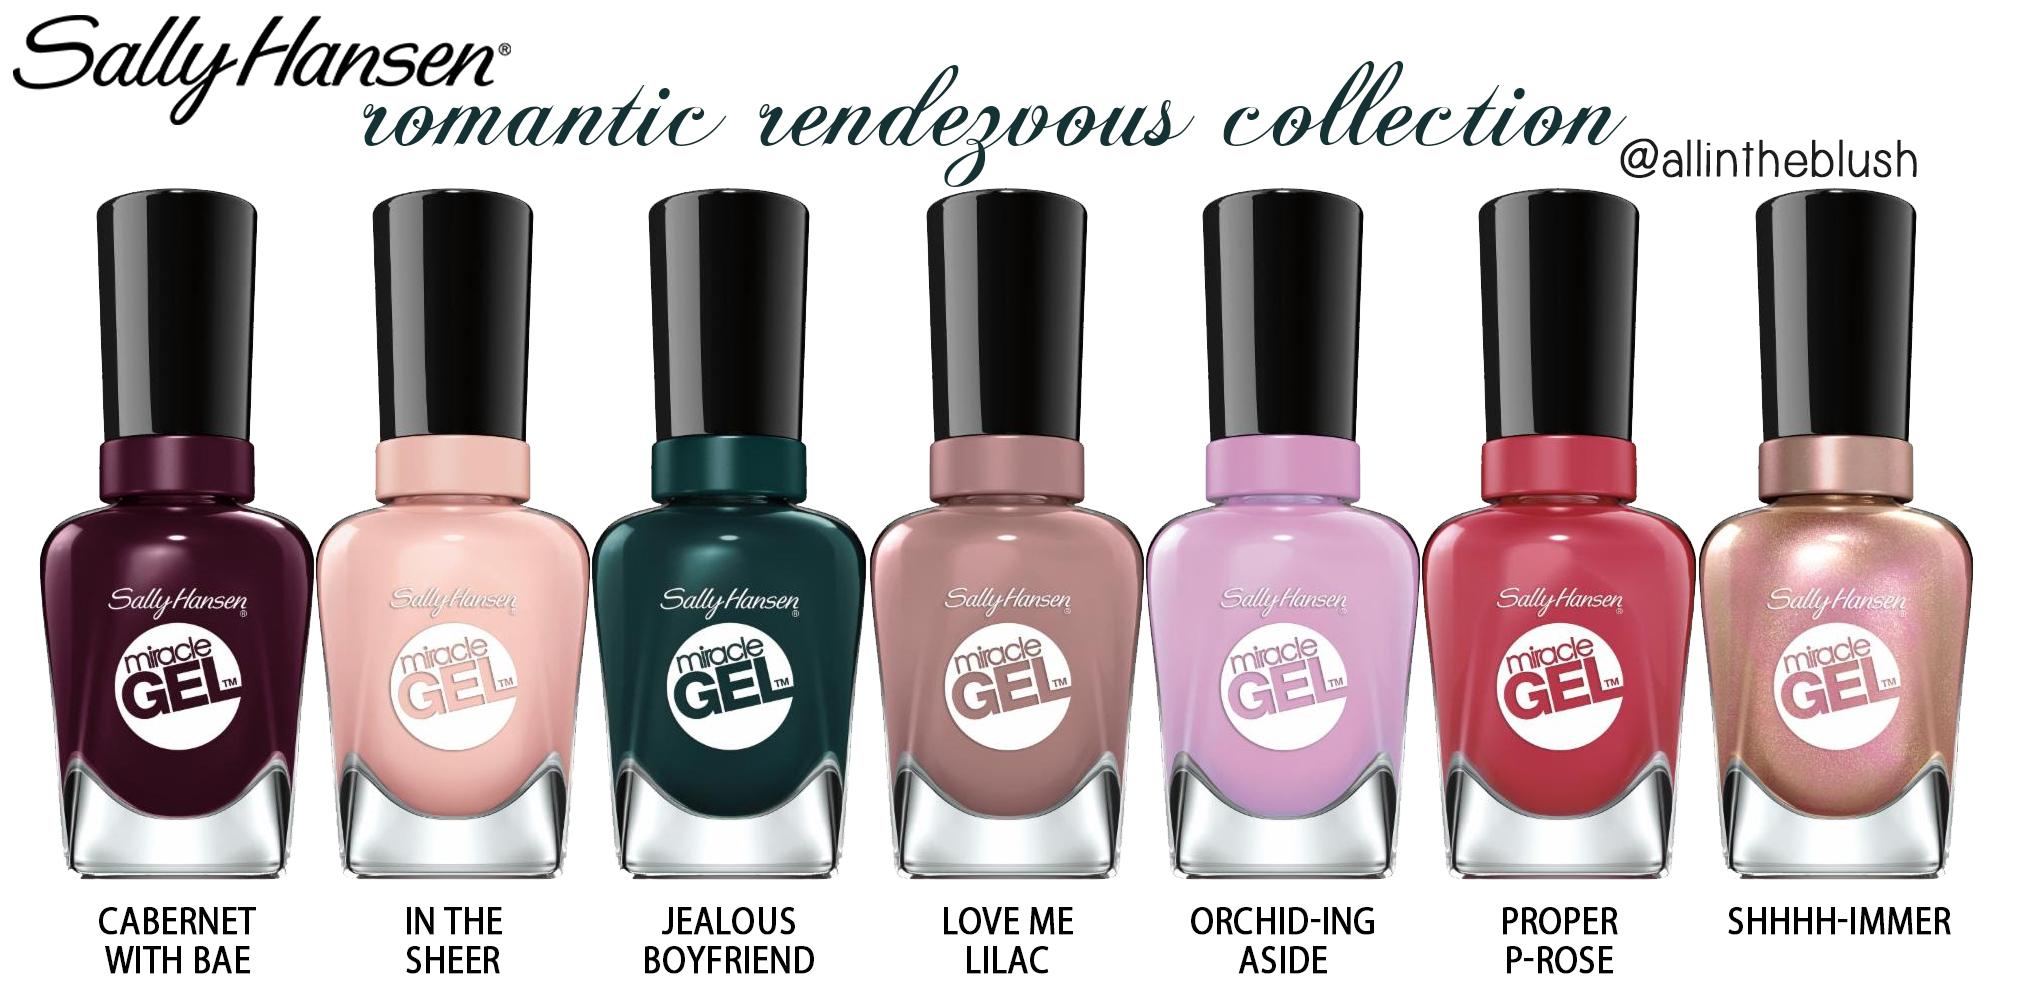 Romantic Rendezvous Collection